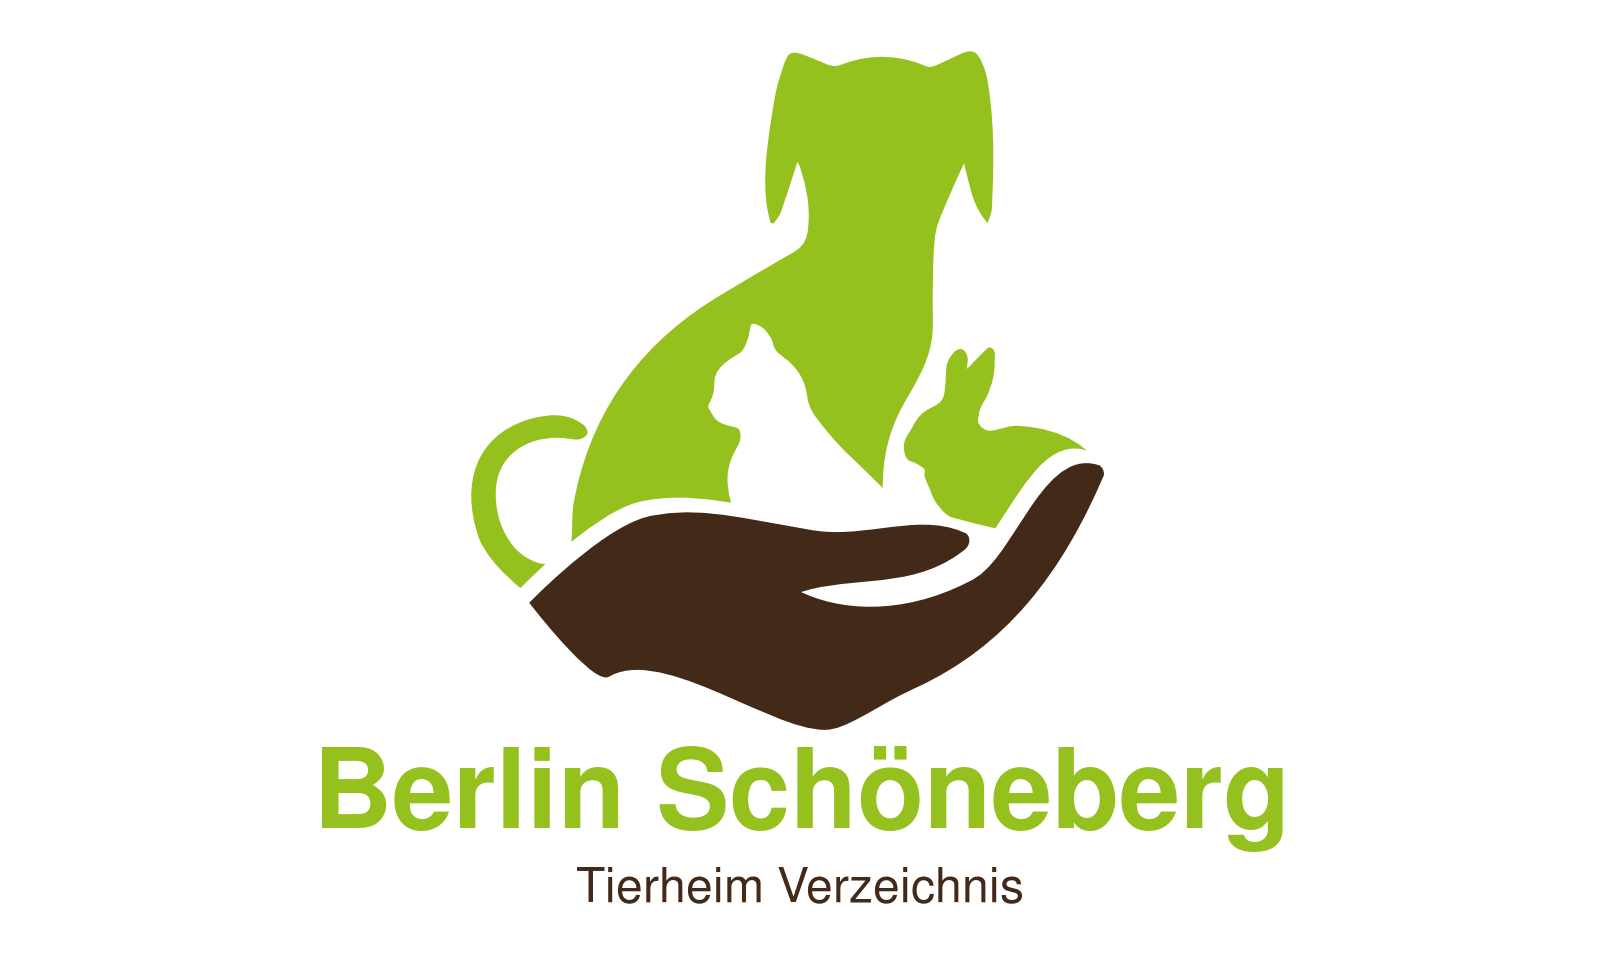 Tierheim Berlin Schöneberg